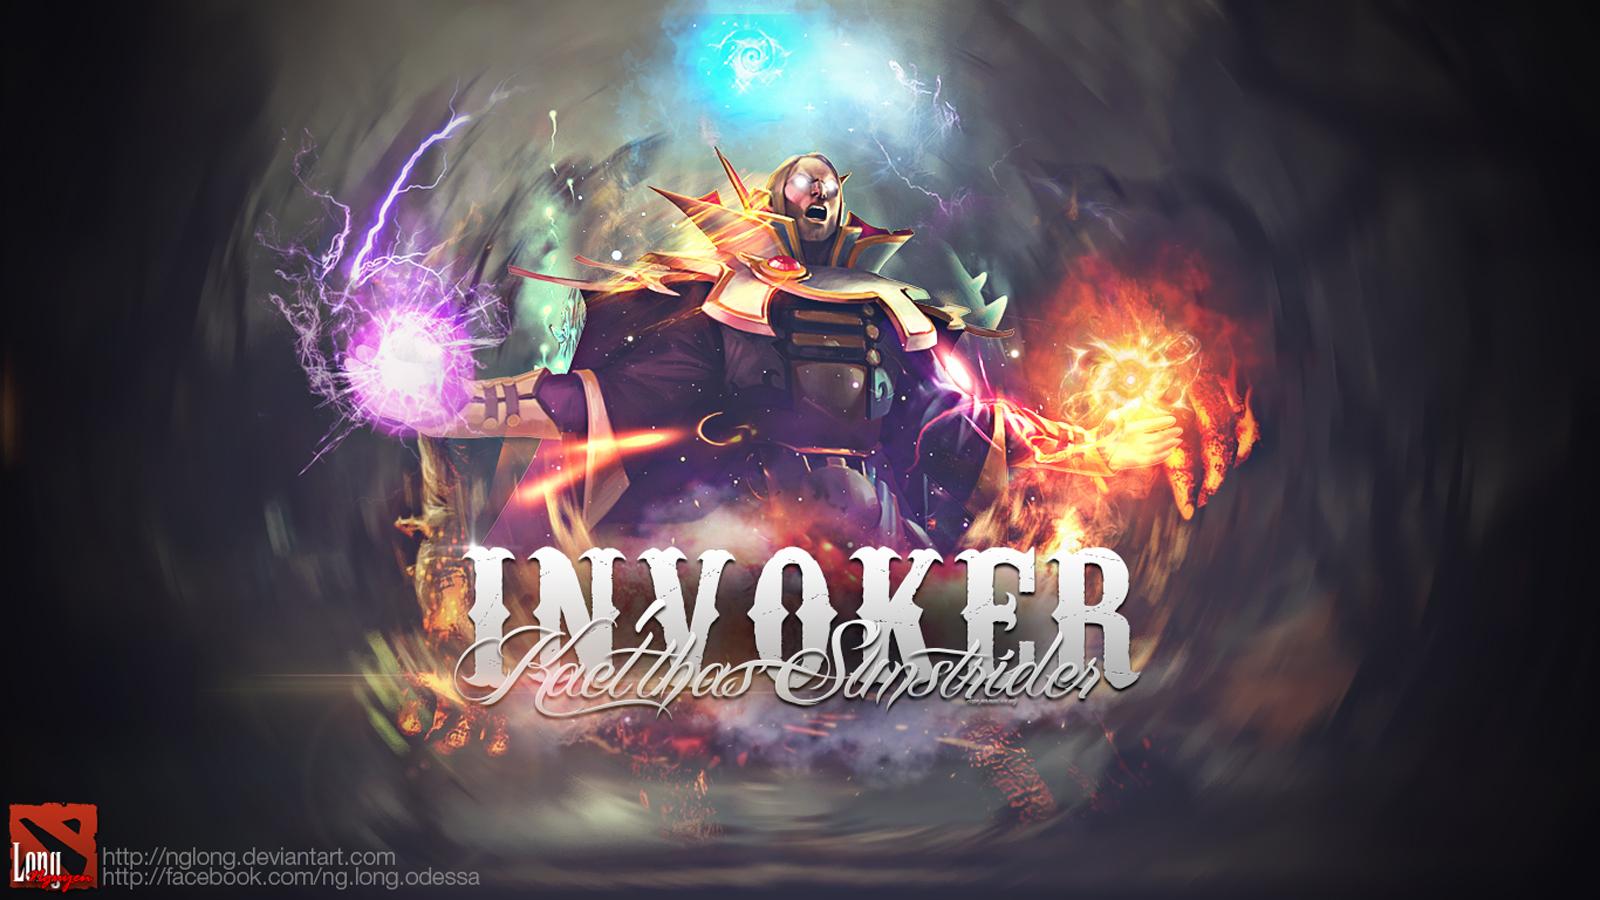 Invoker Dota 2 1600x900 2h Wallpaper HD